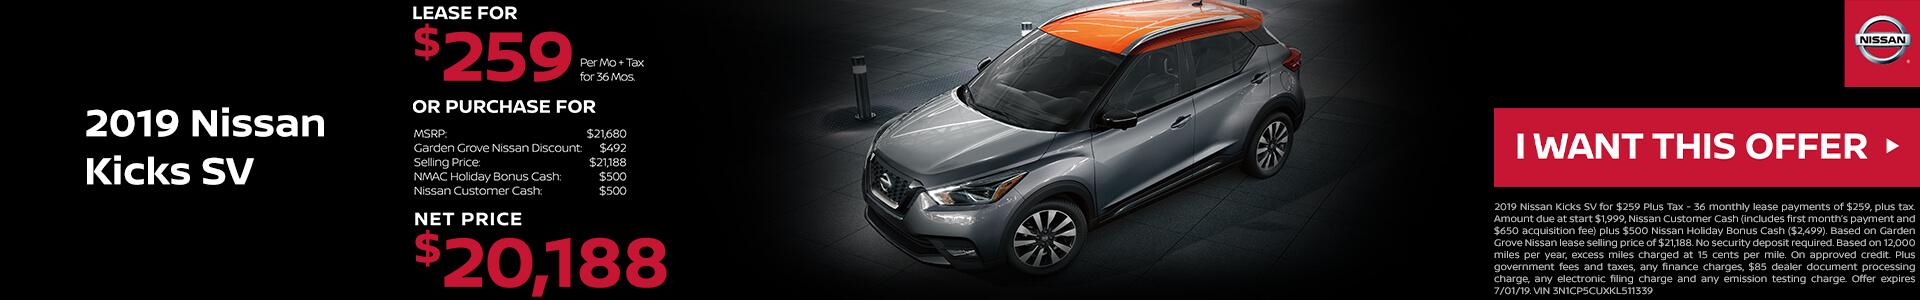 2019 Nissan Kicks Lease for $259